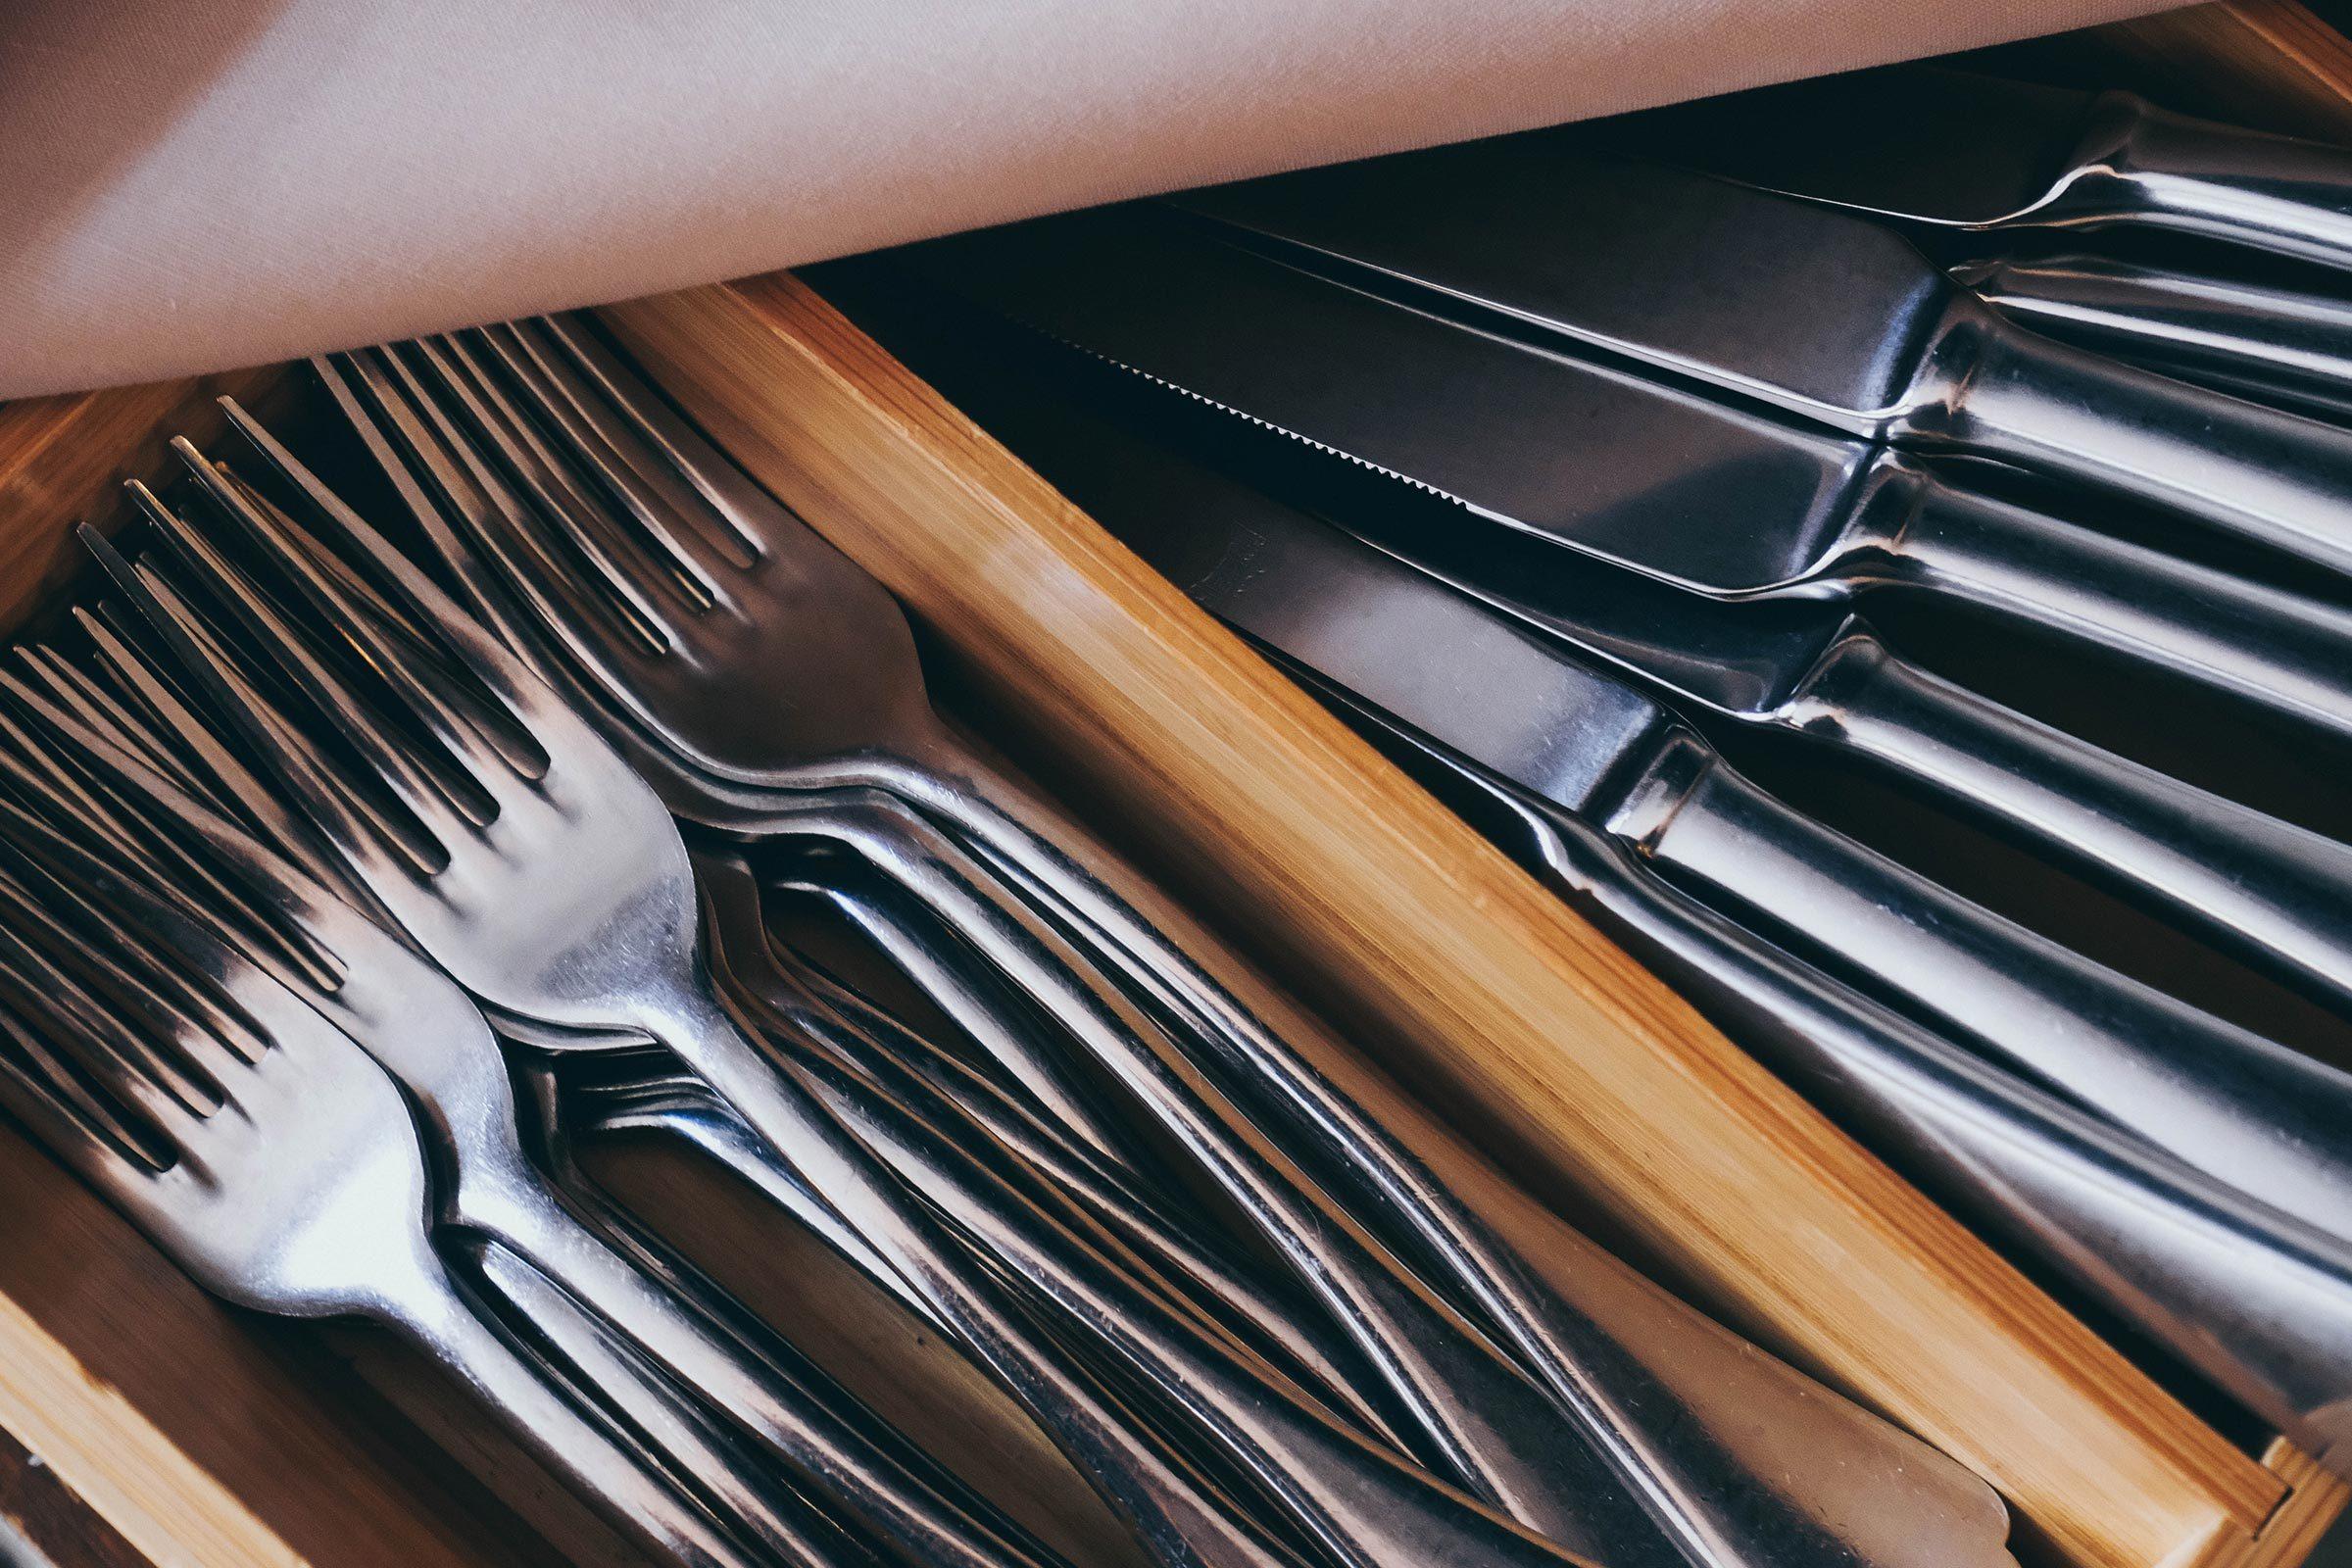 silverware utensils in a drawer